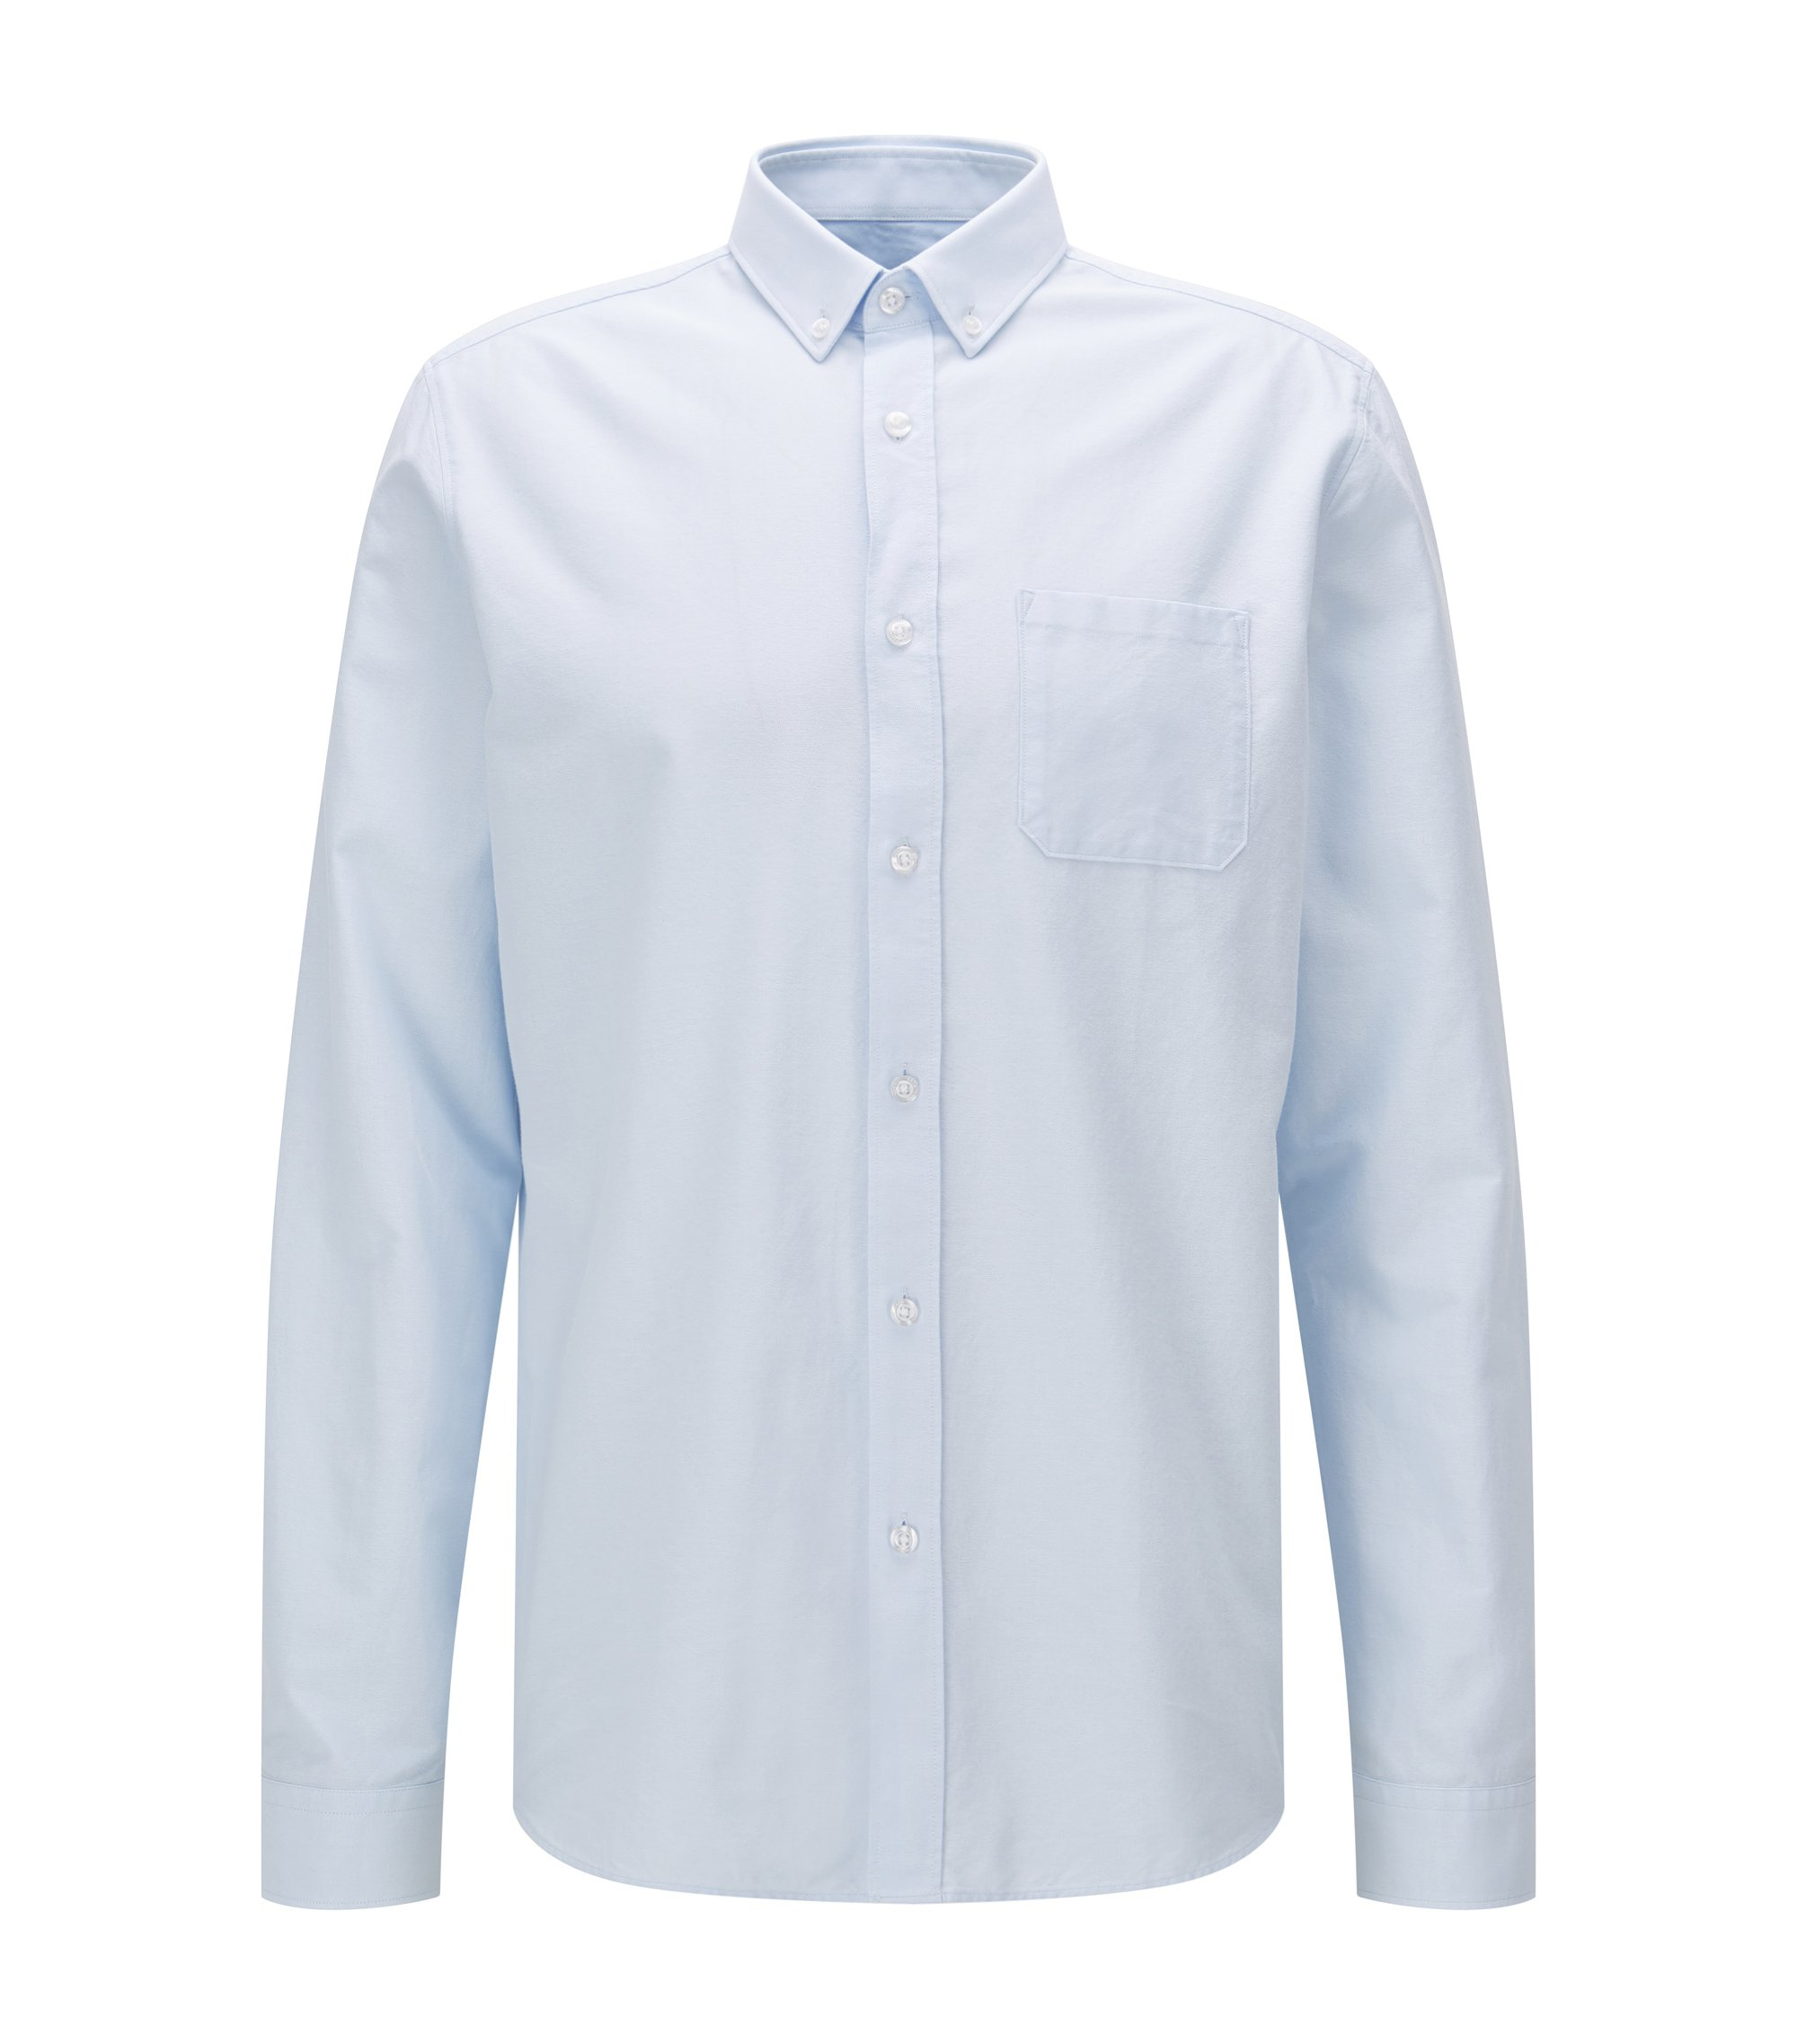 Relaxed-fit Oxfordoverhemd van gewassen katoen, Lichtblauw